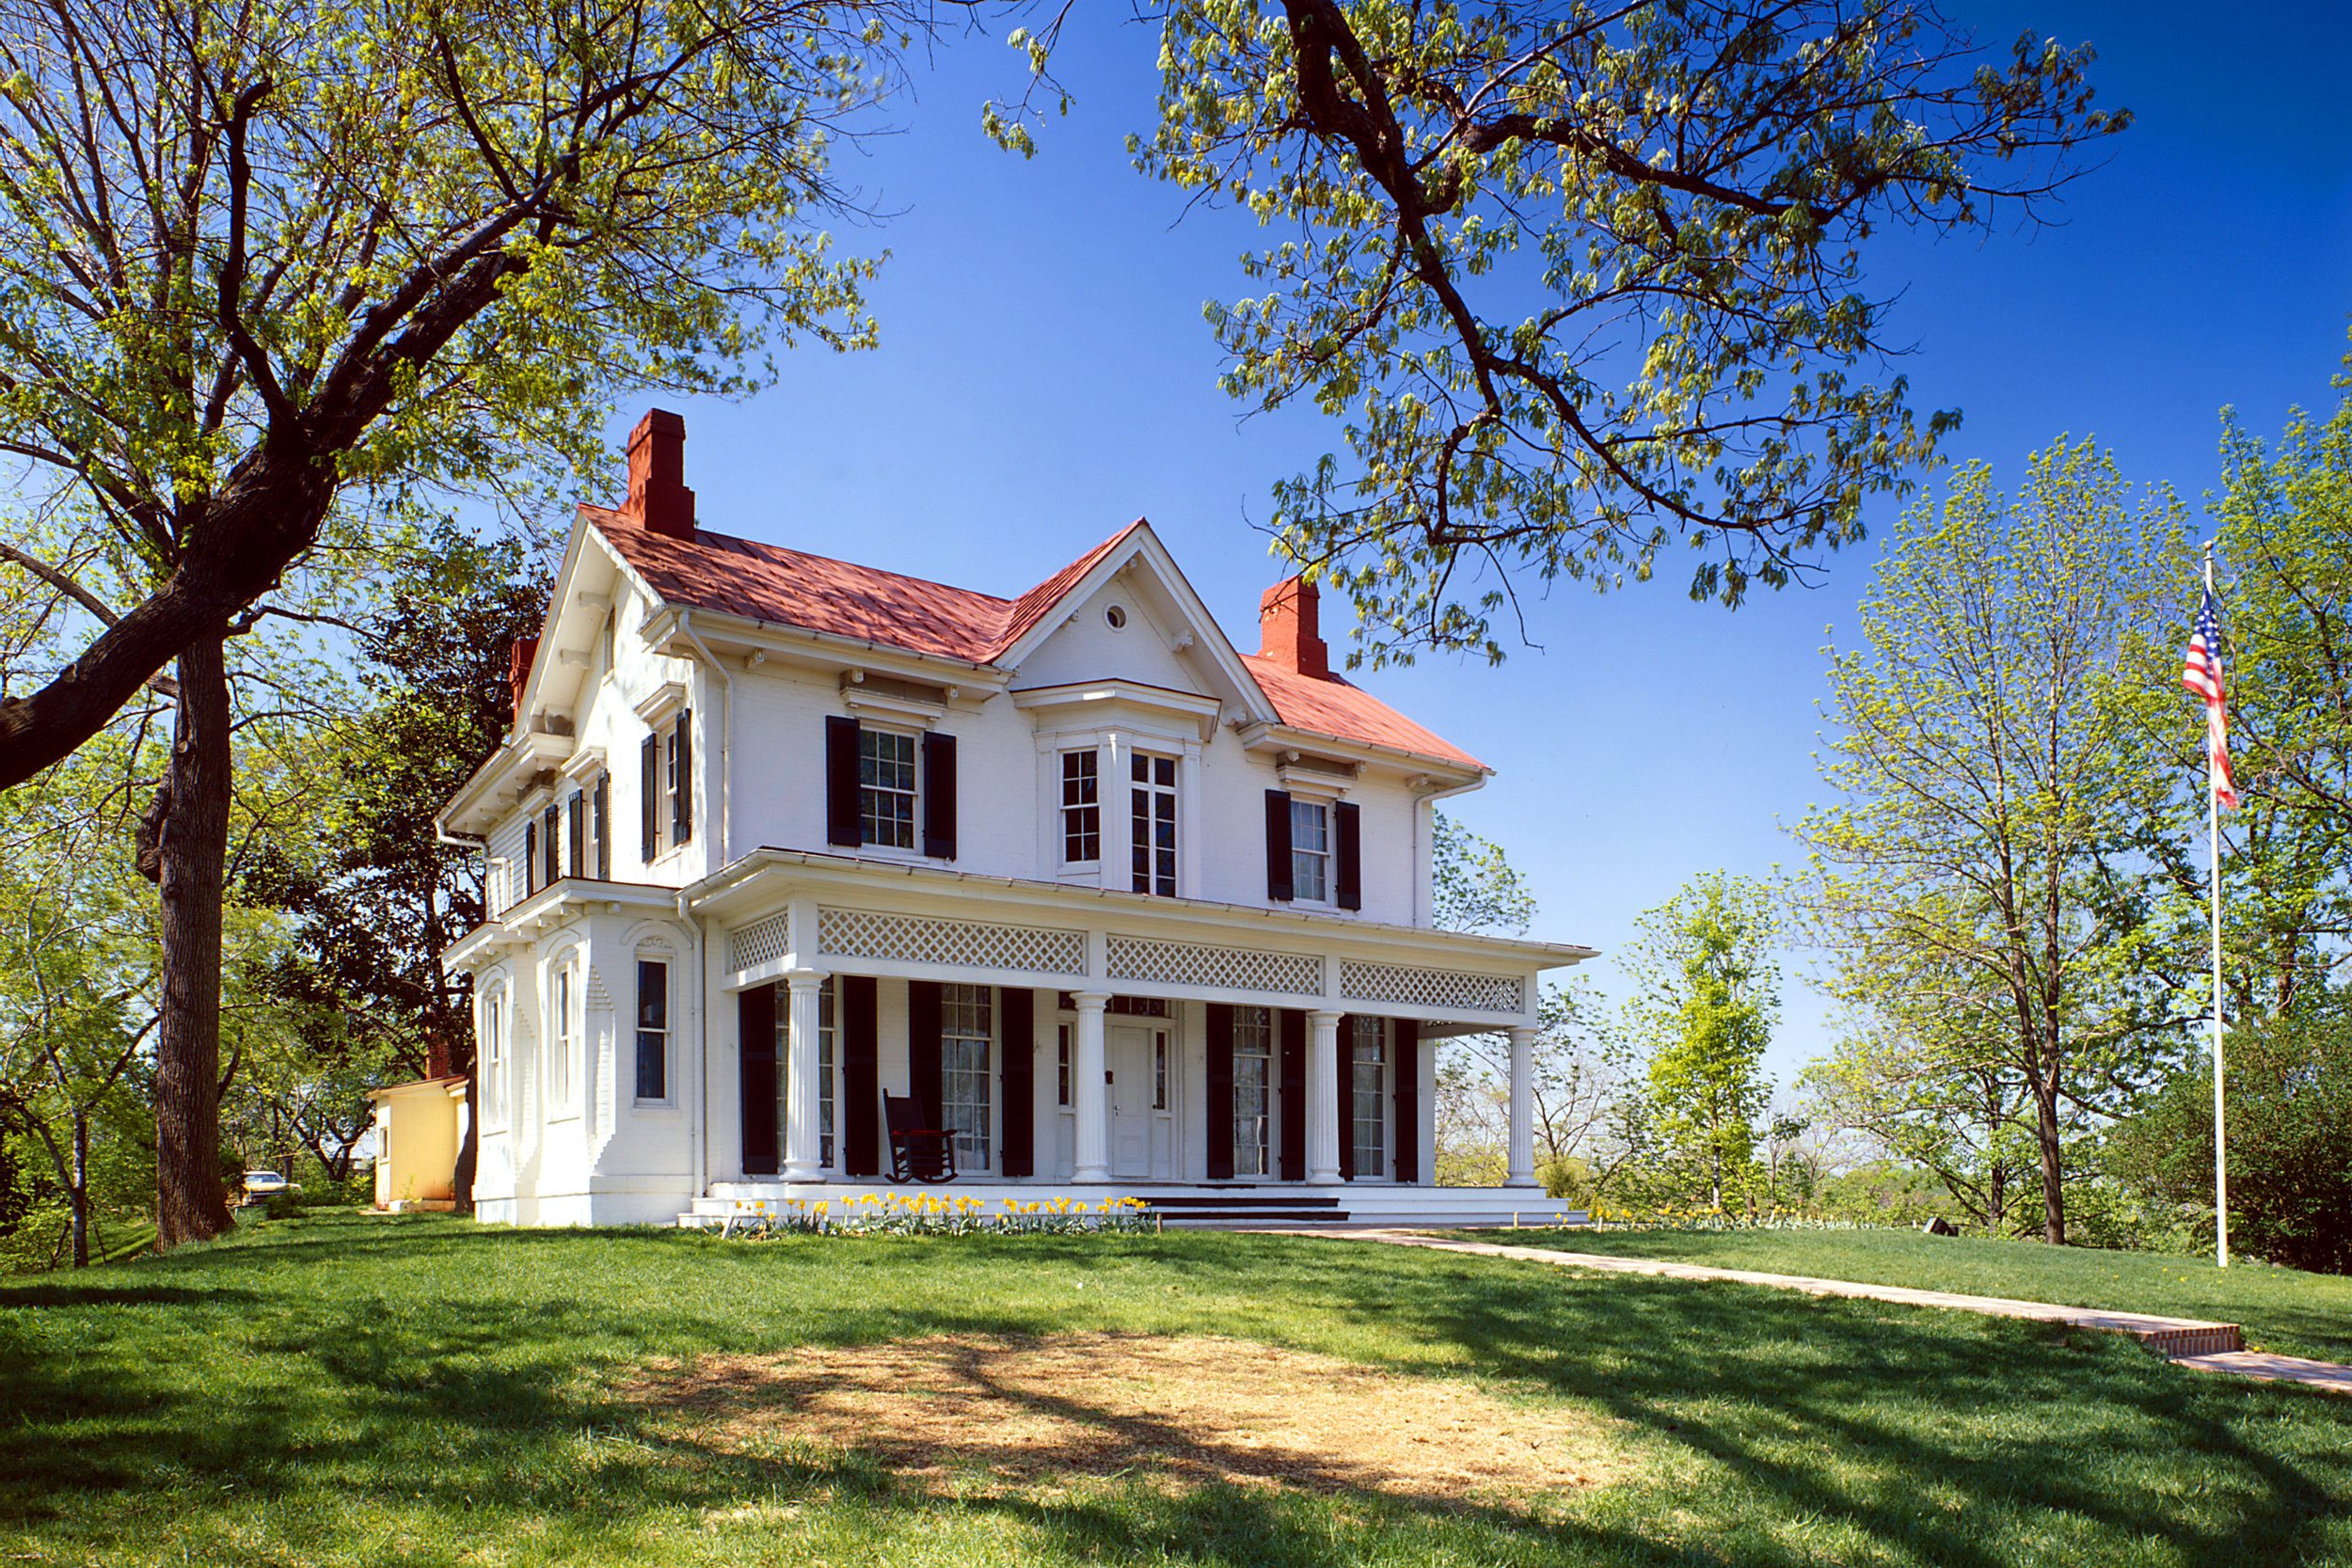 Frederick_Douglass_House.jpg